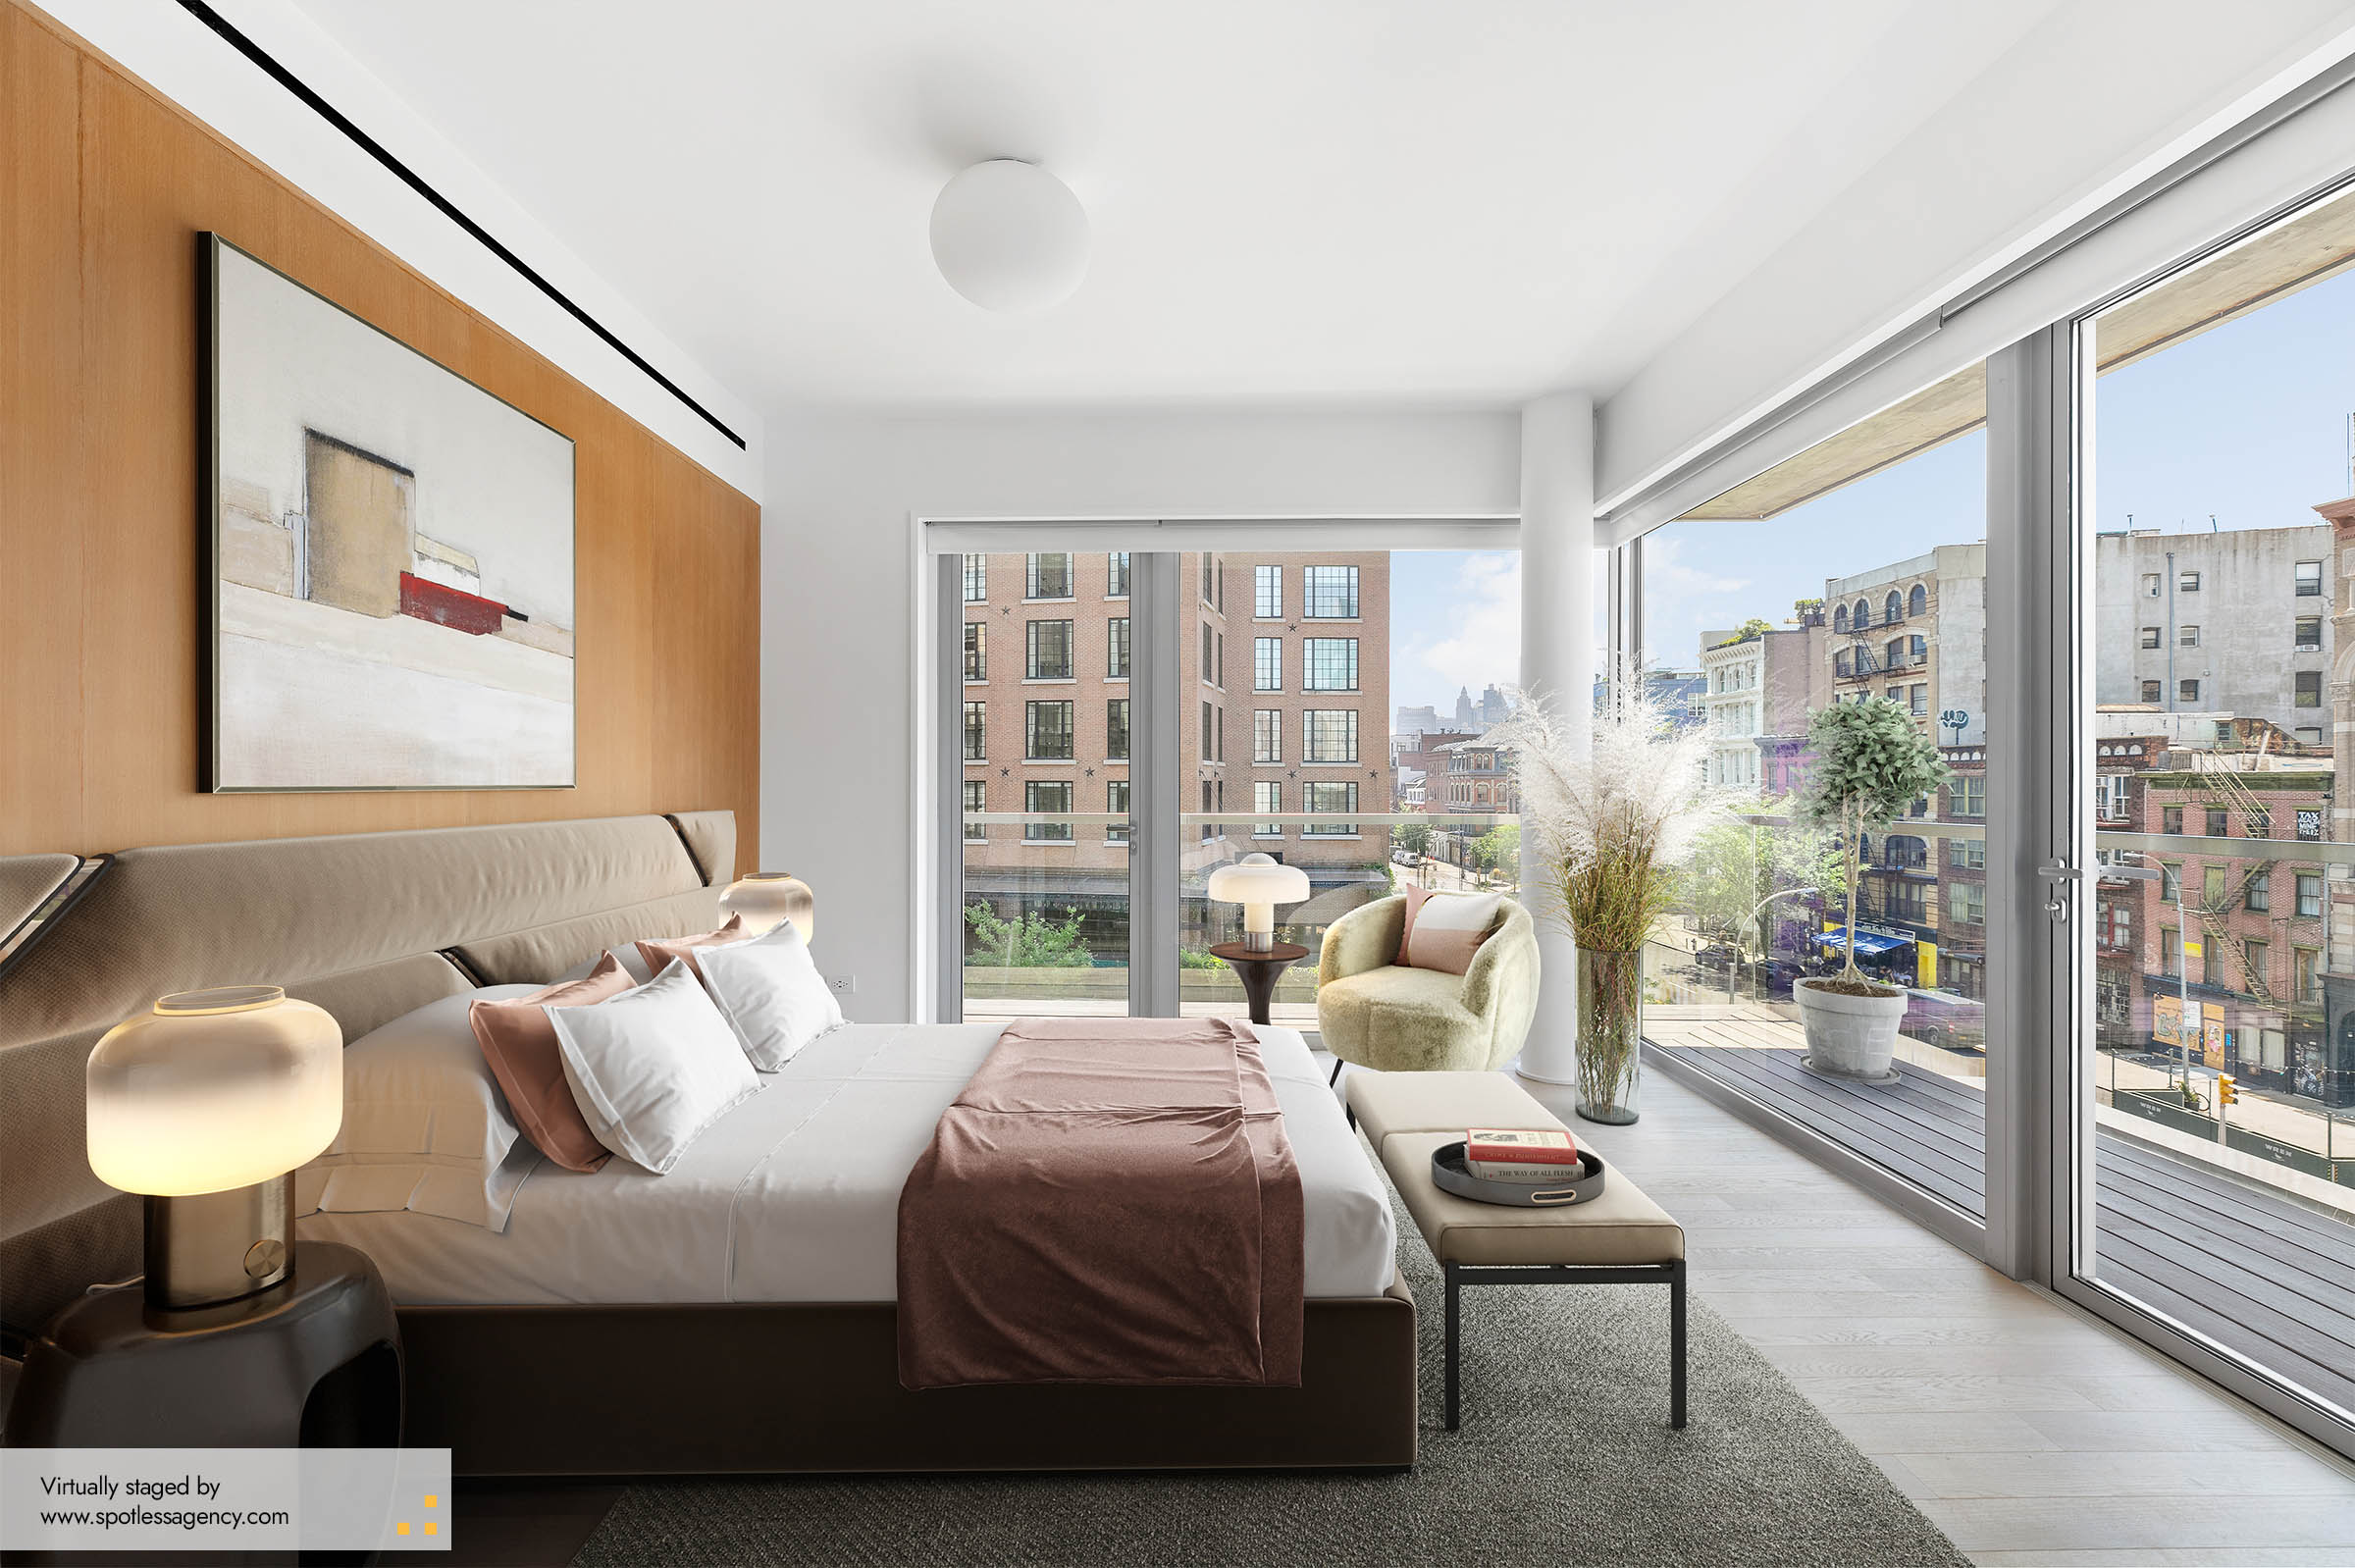 Spotless_agency_virtual_staging_bedroom_1